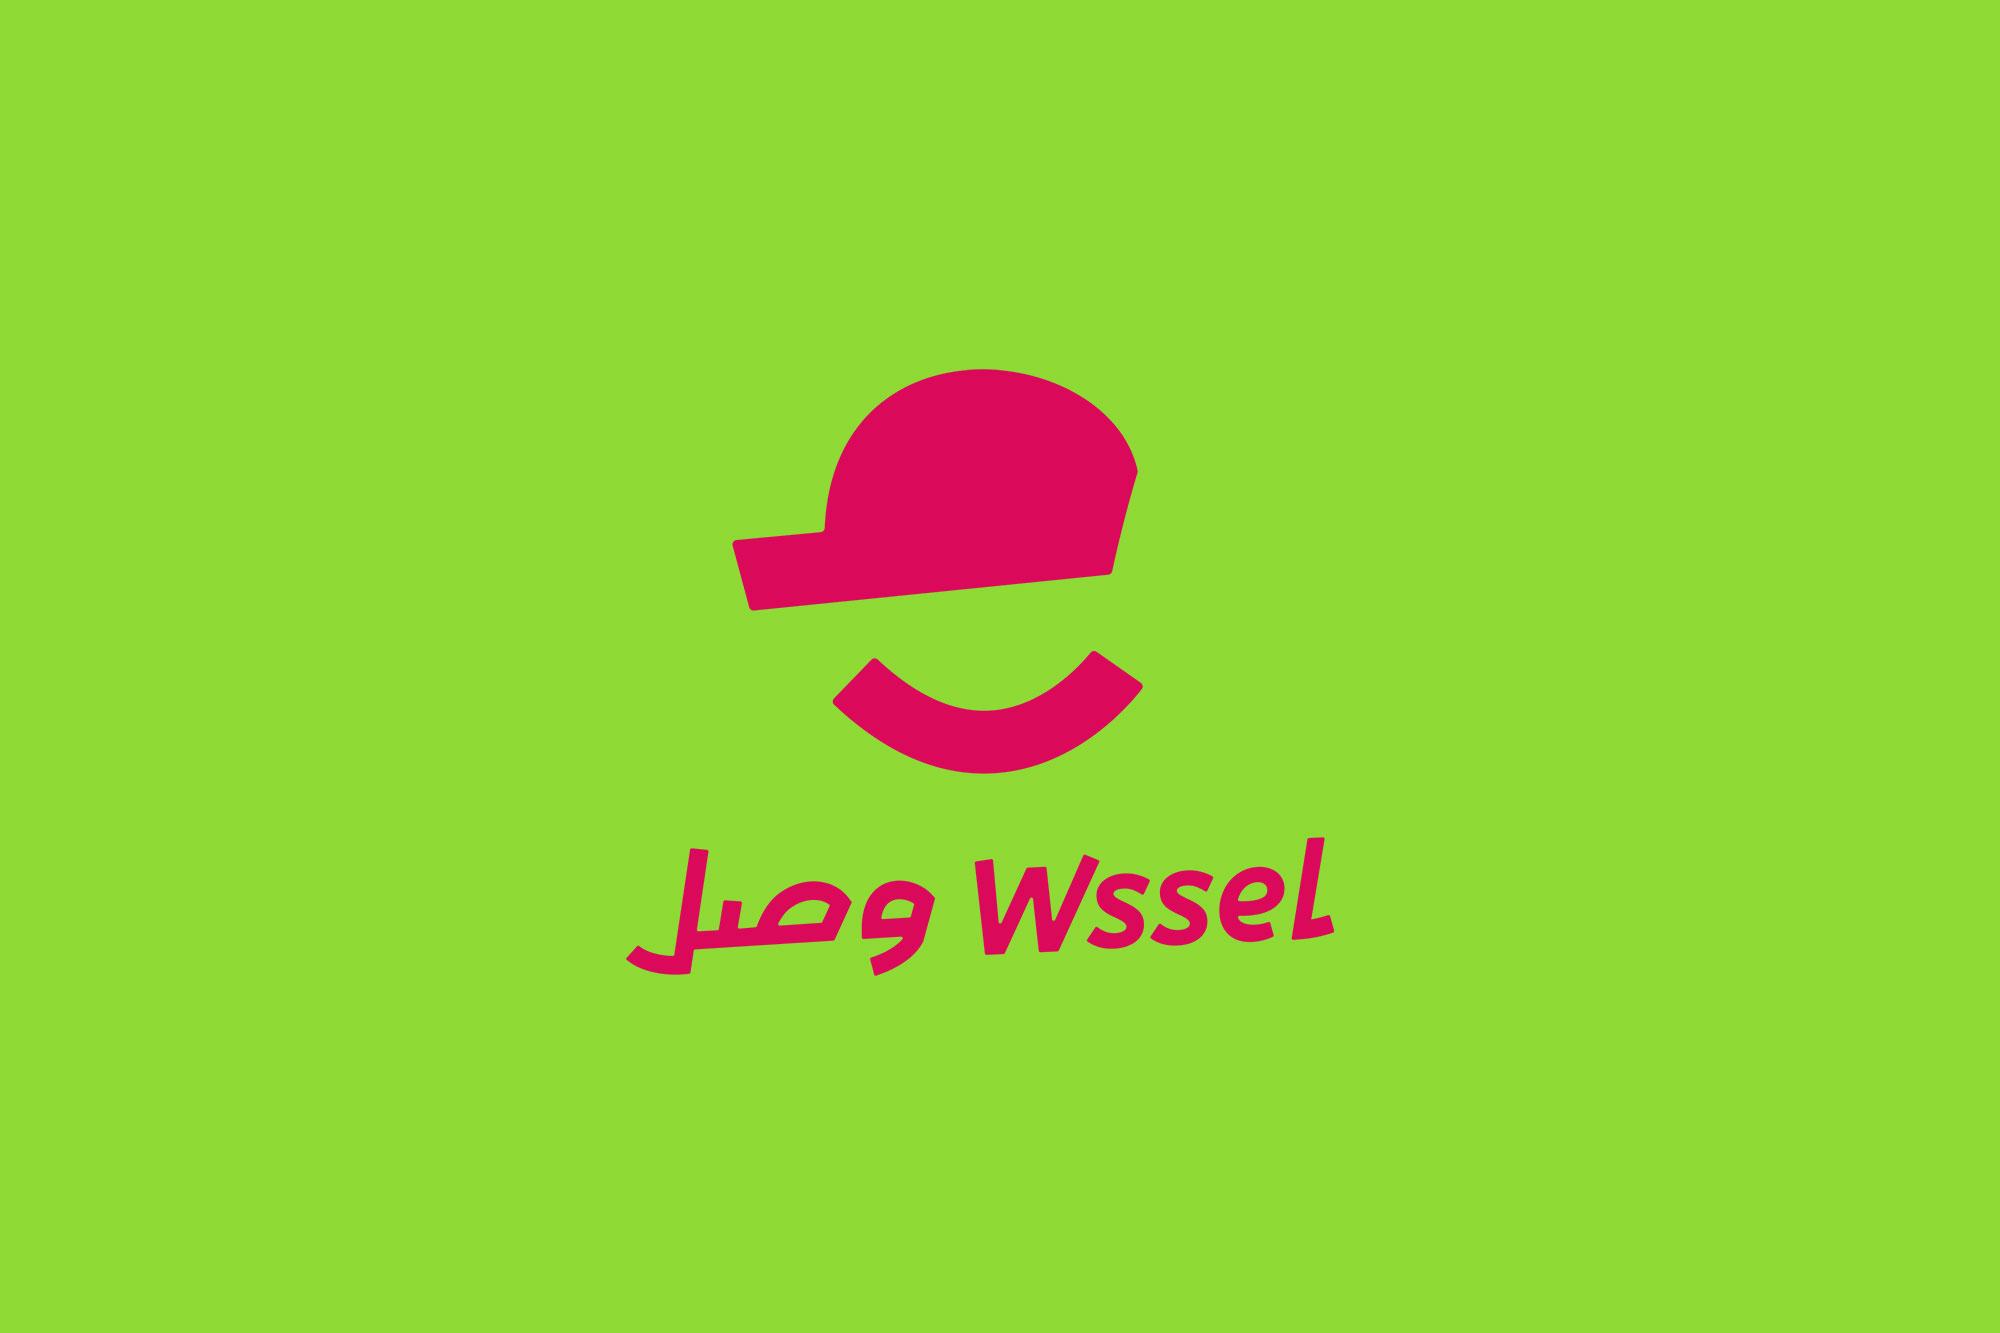 Wssel-Work-By-YaStudio-Logo-04